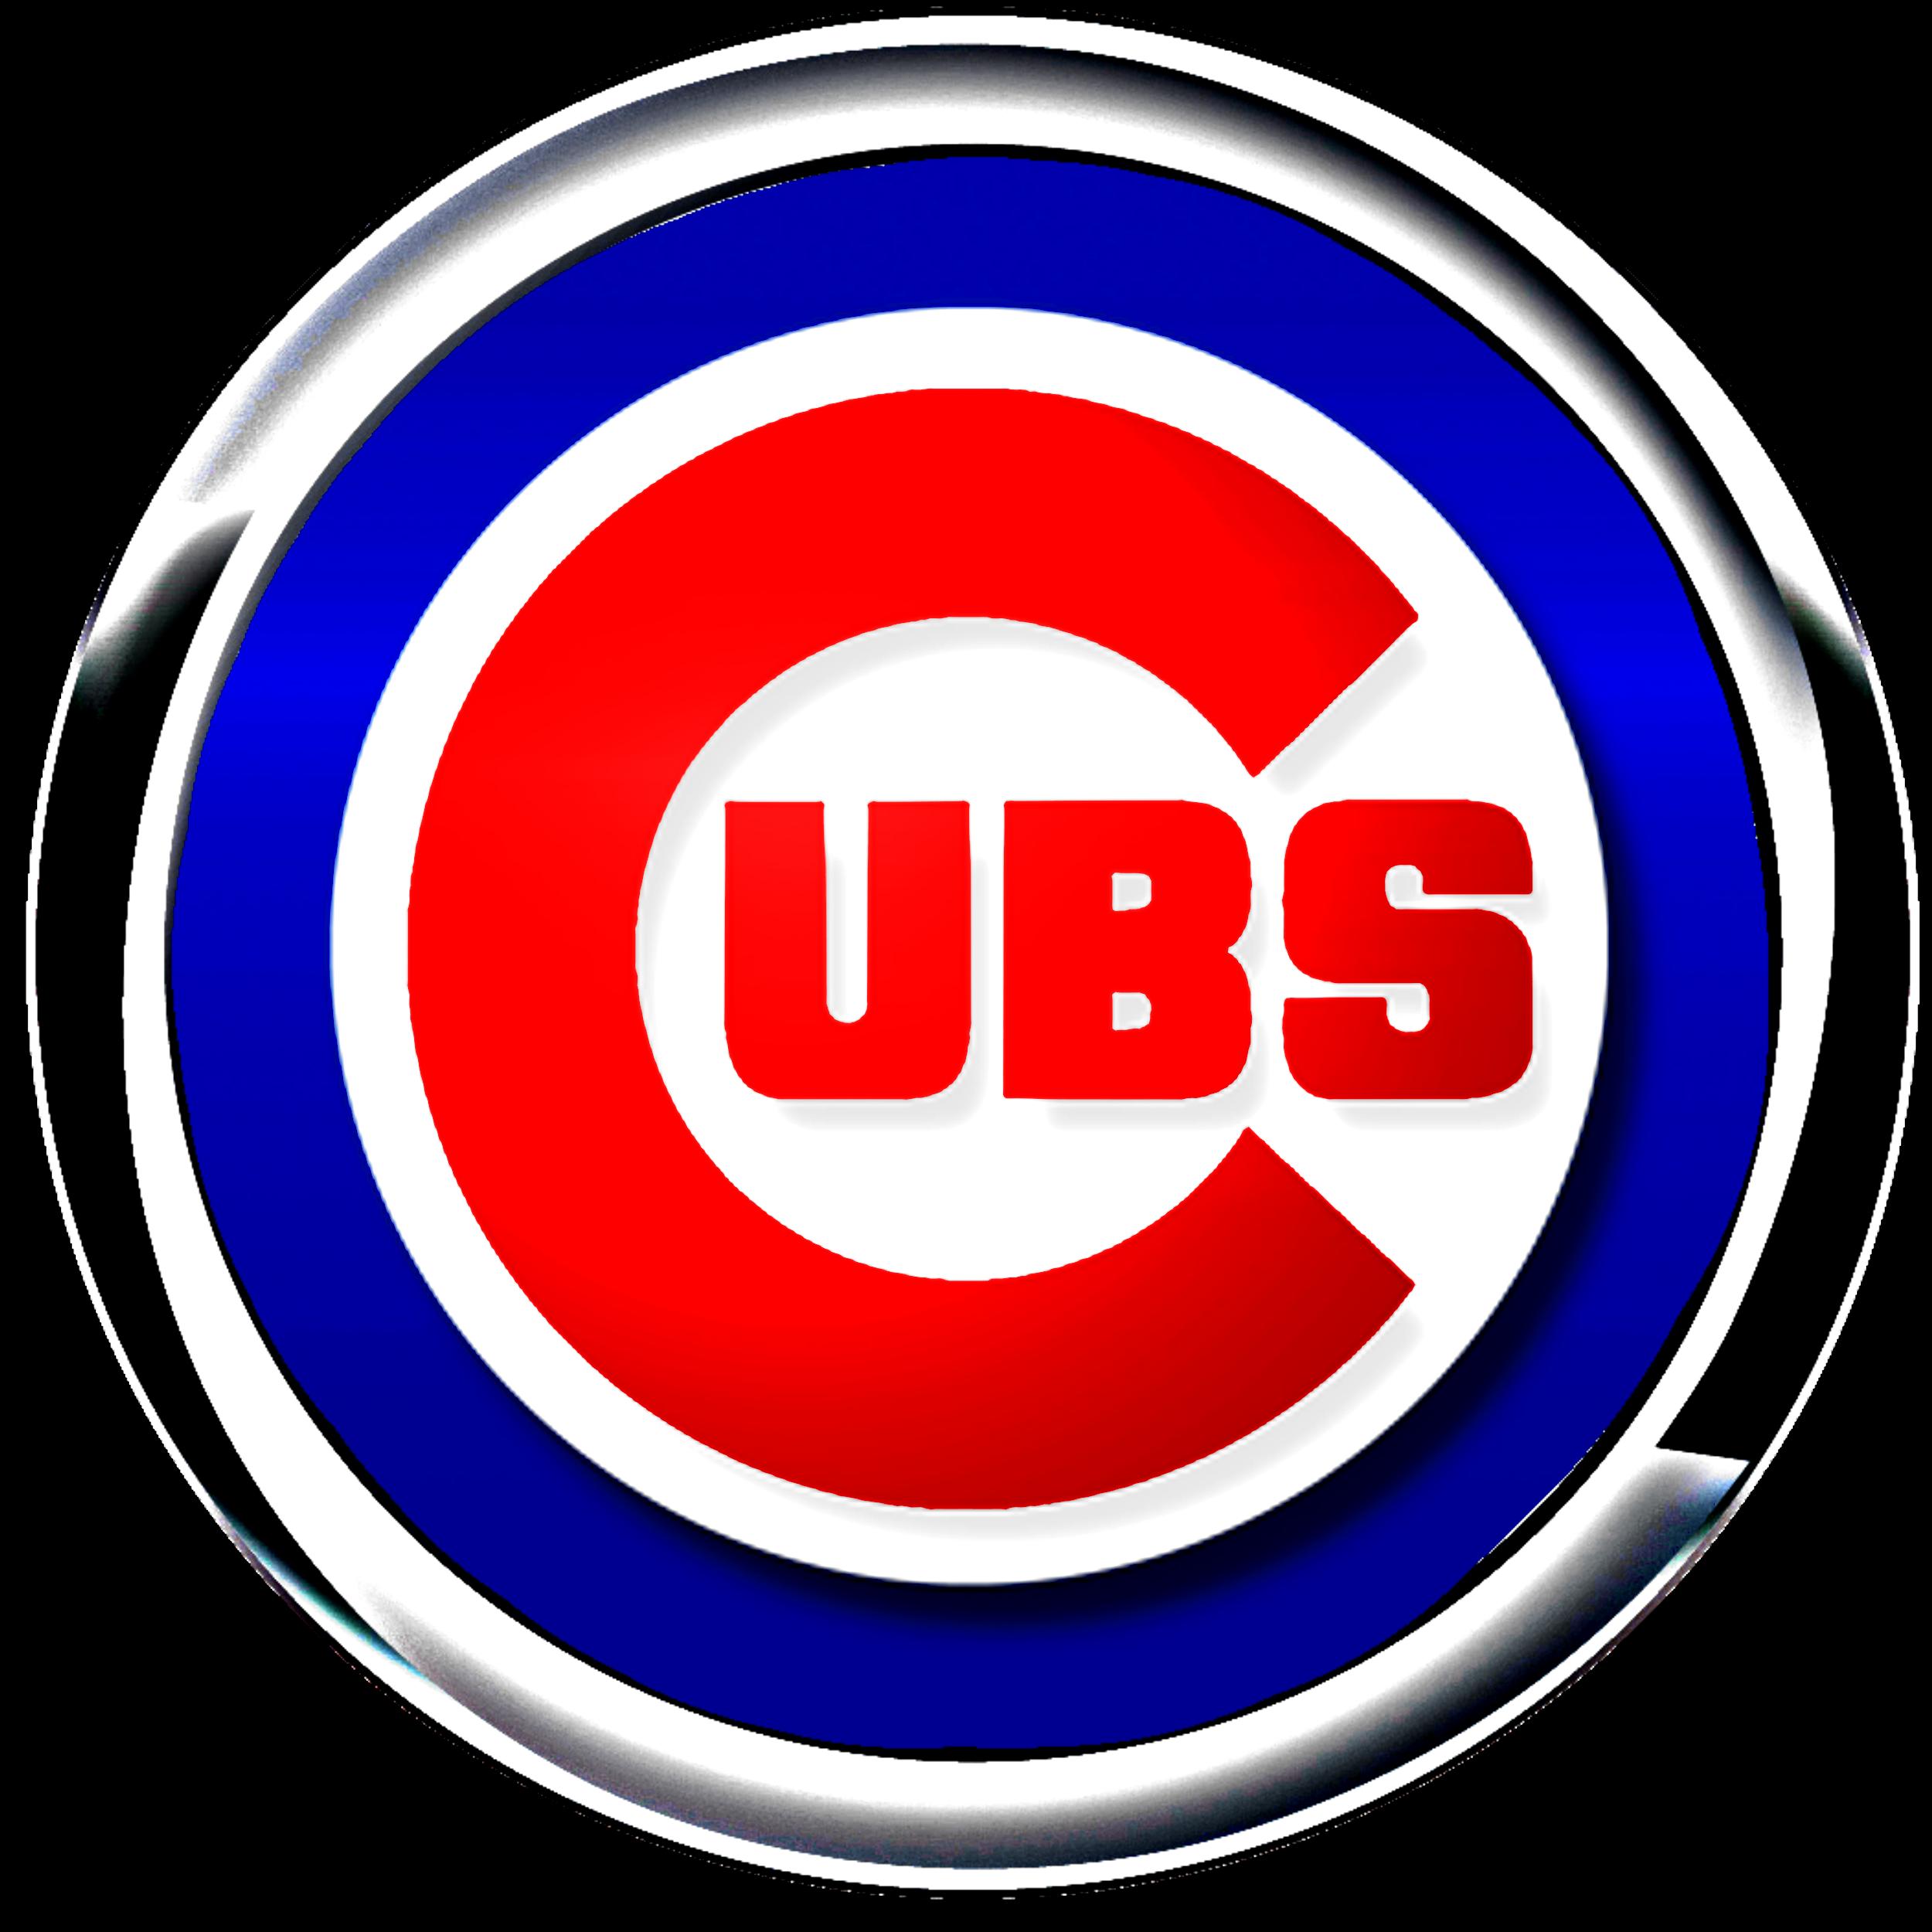 CHICAGO CUBS CREATIONS 2 CHICAGO CUBS CREATIONS 2